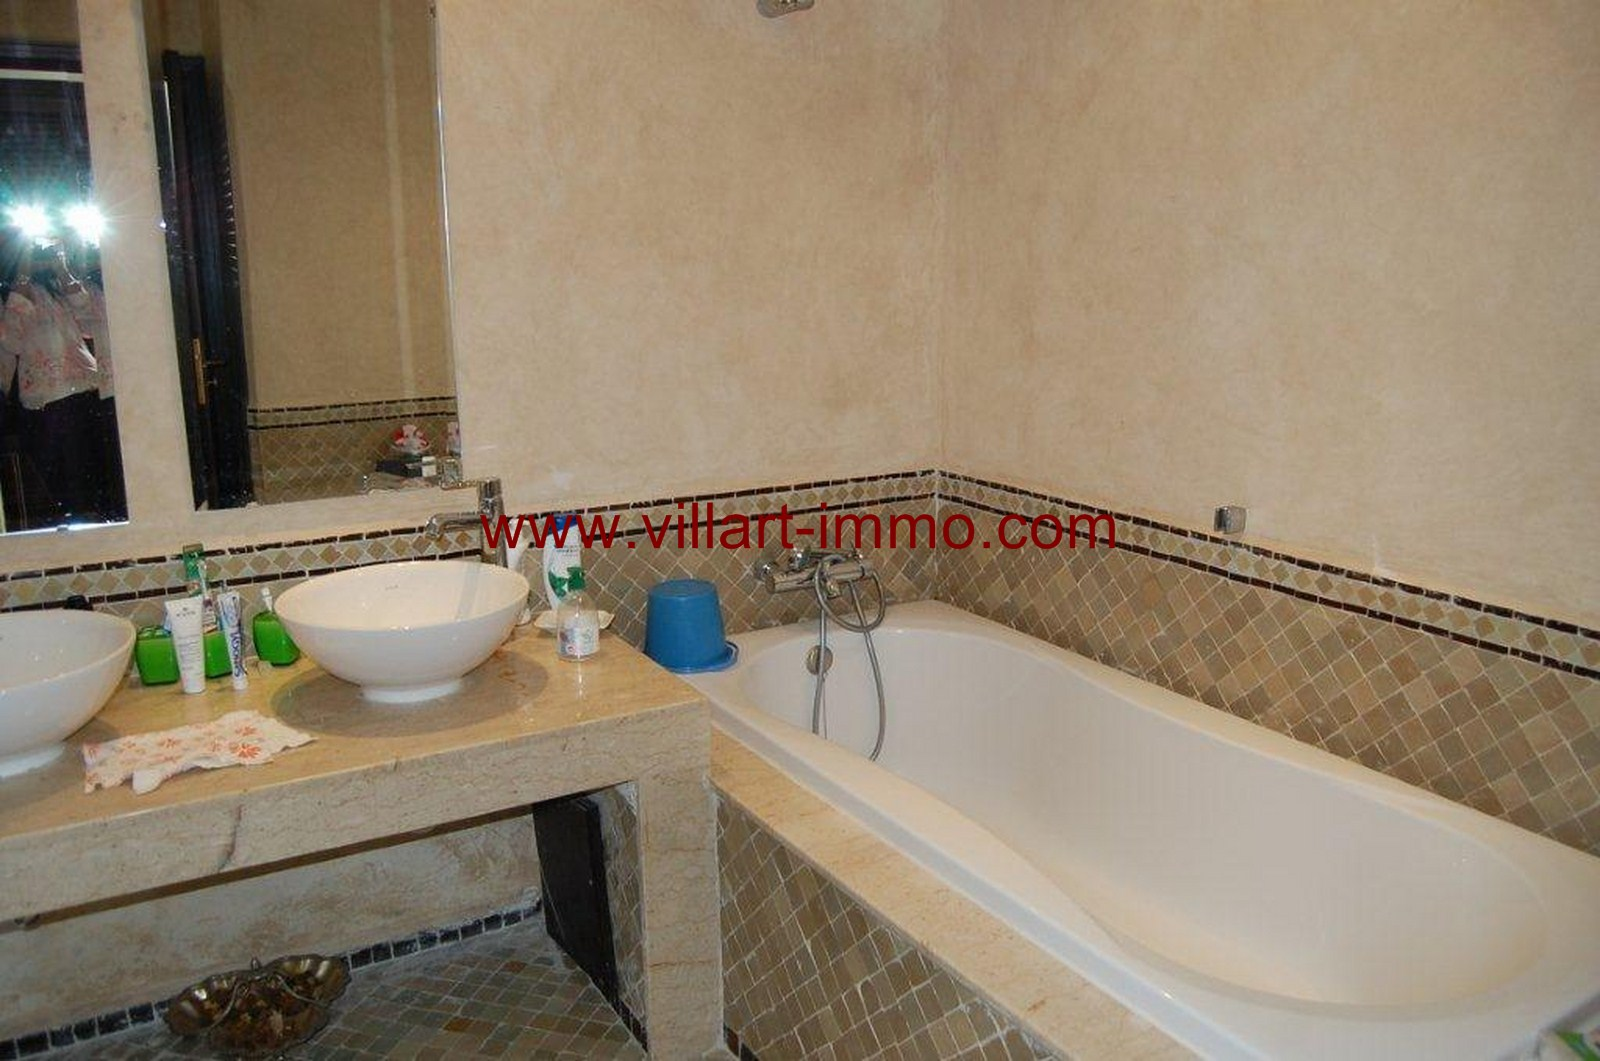 9-location-villa-meuble-malabata-tanger-salle-de-bain-1-lv884-villart-immo